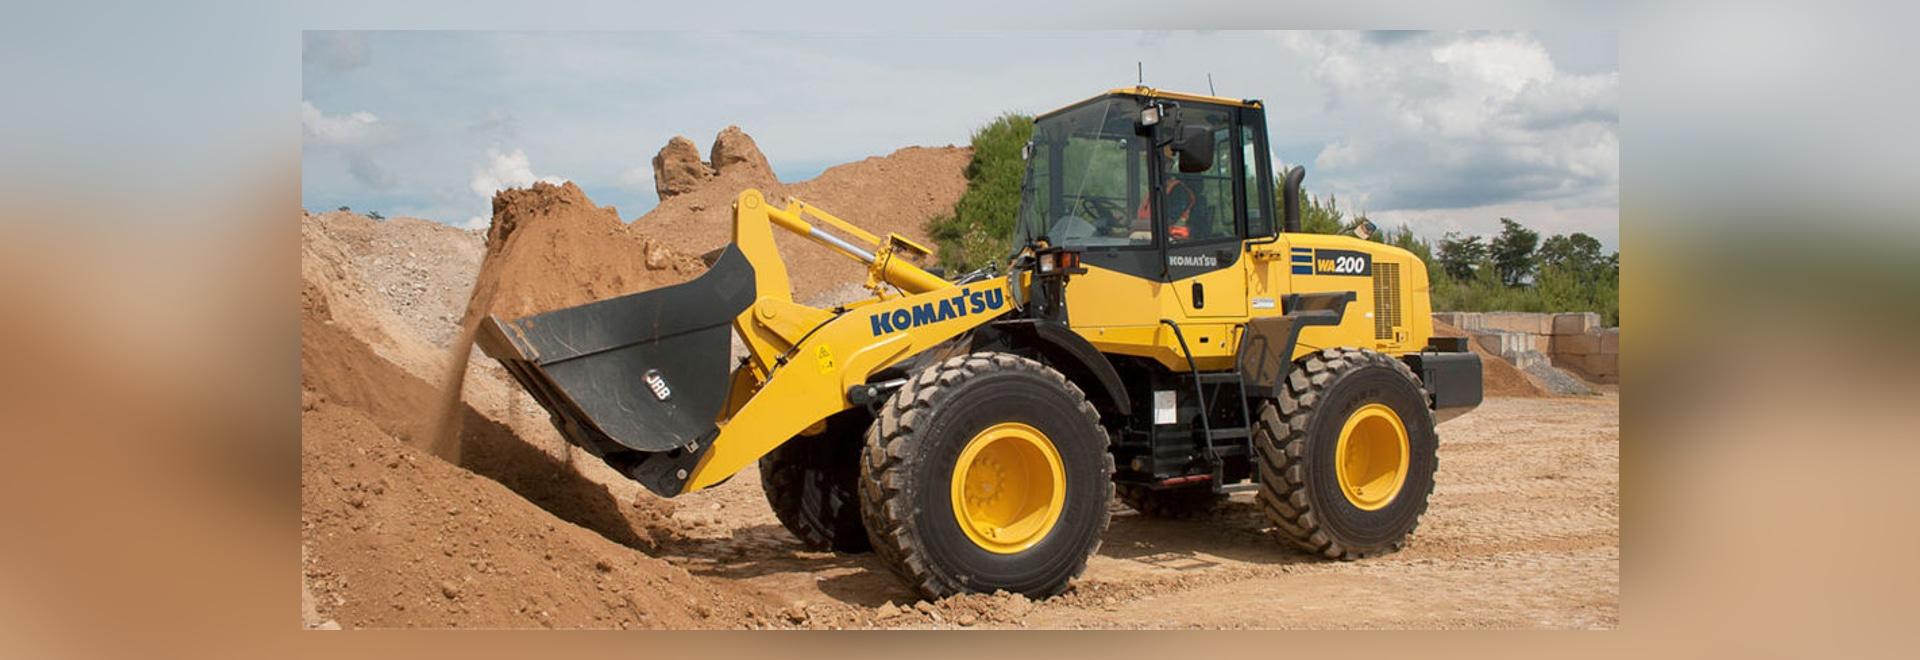 NEW: wheel loader by Komatsu Construction and Mining Equipment